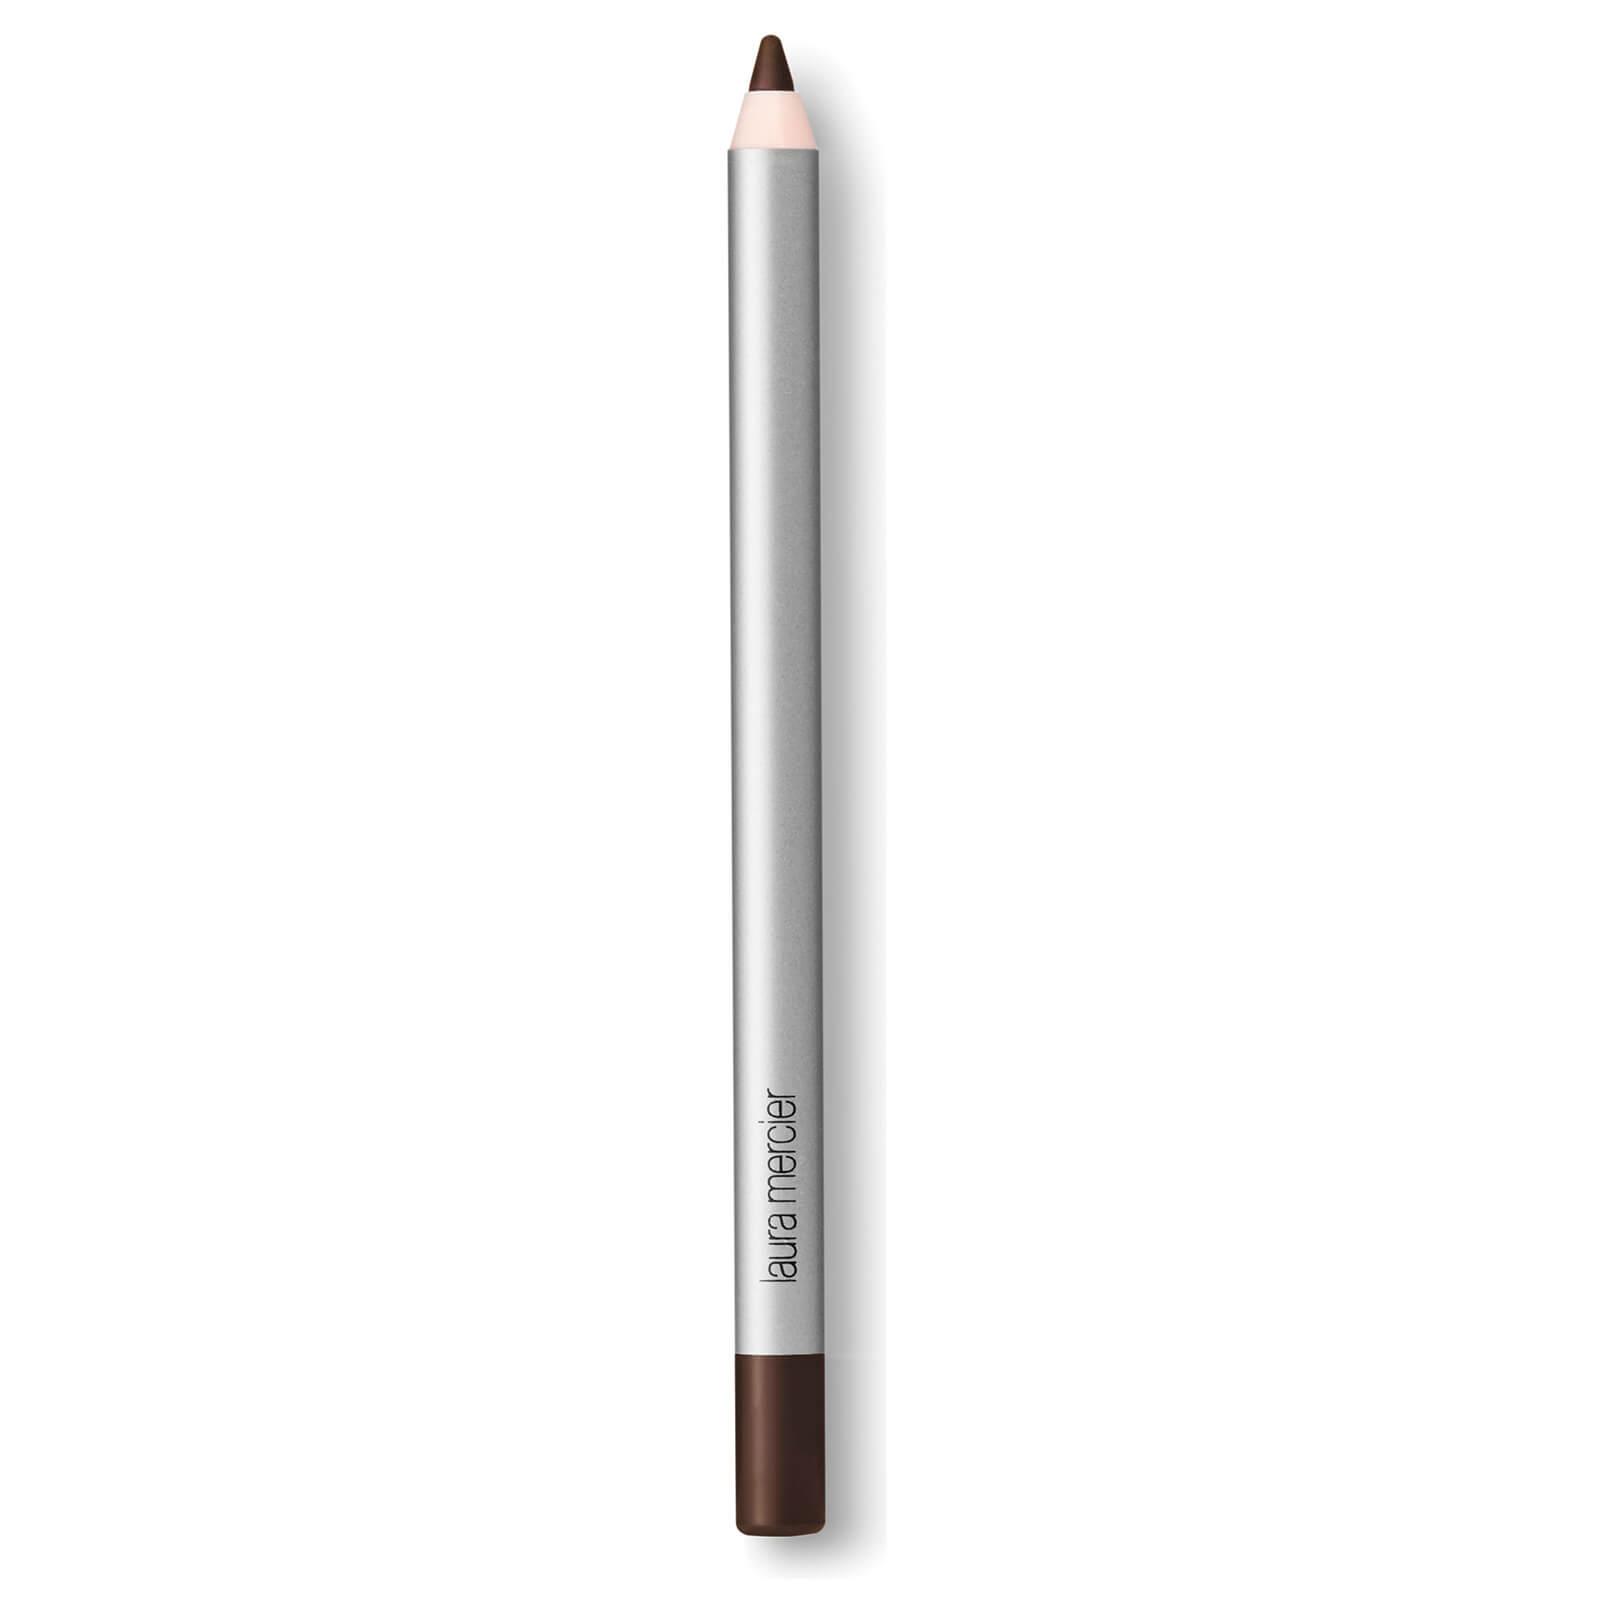 Laura Mercier Longwear Crème Eye Pencil 1.2g (Various Shades) - Espresso